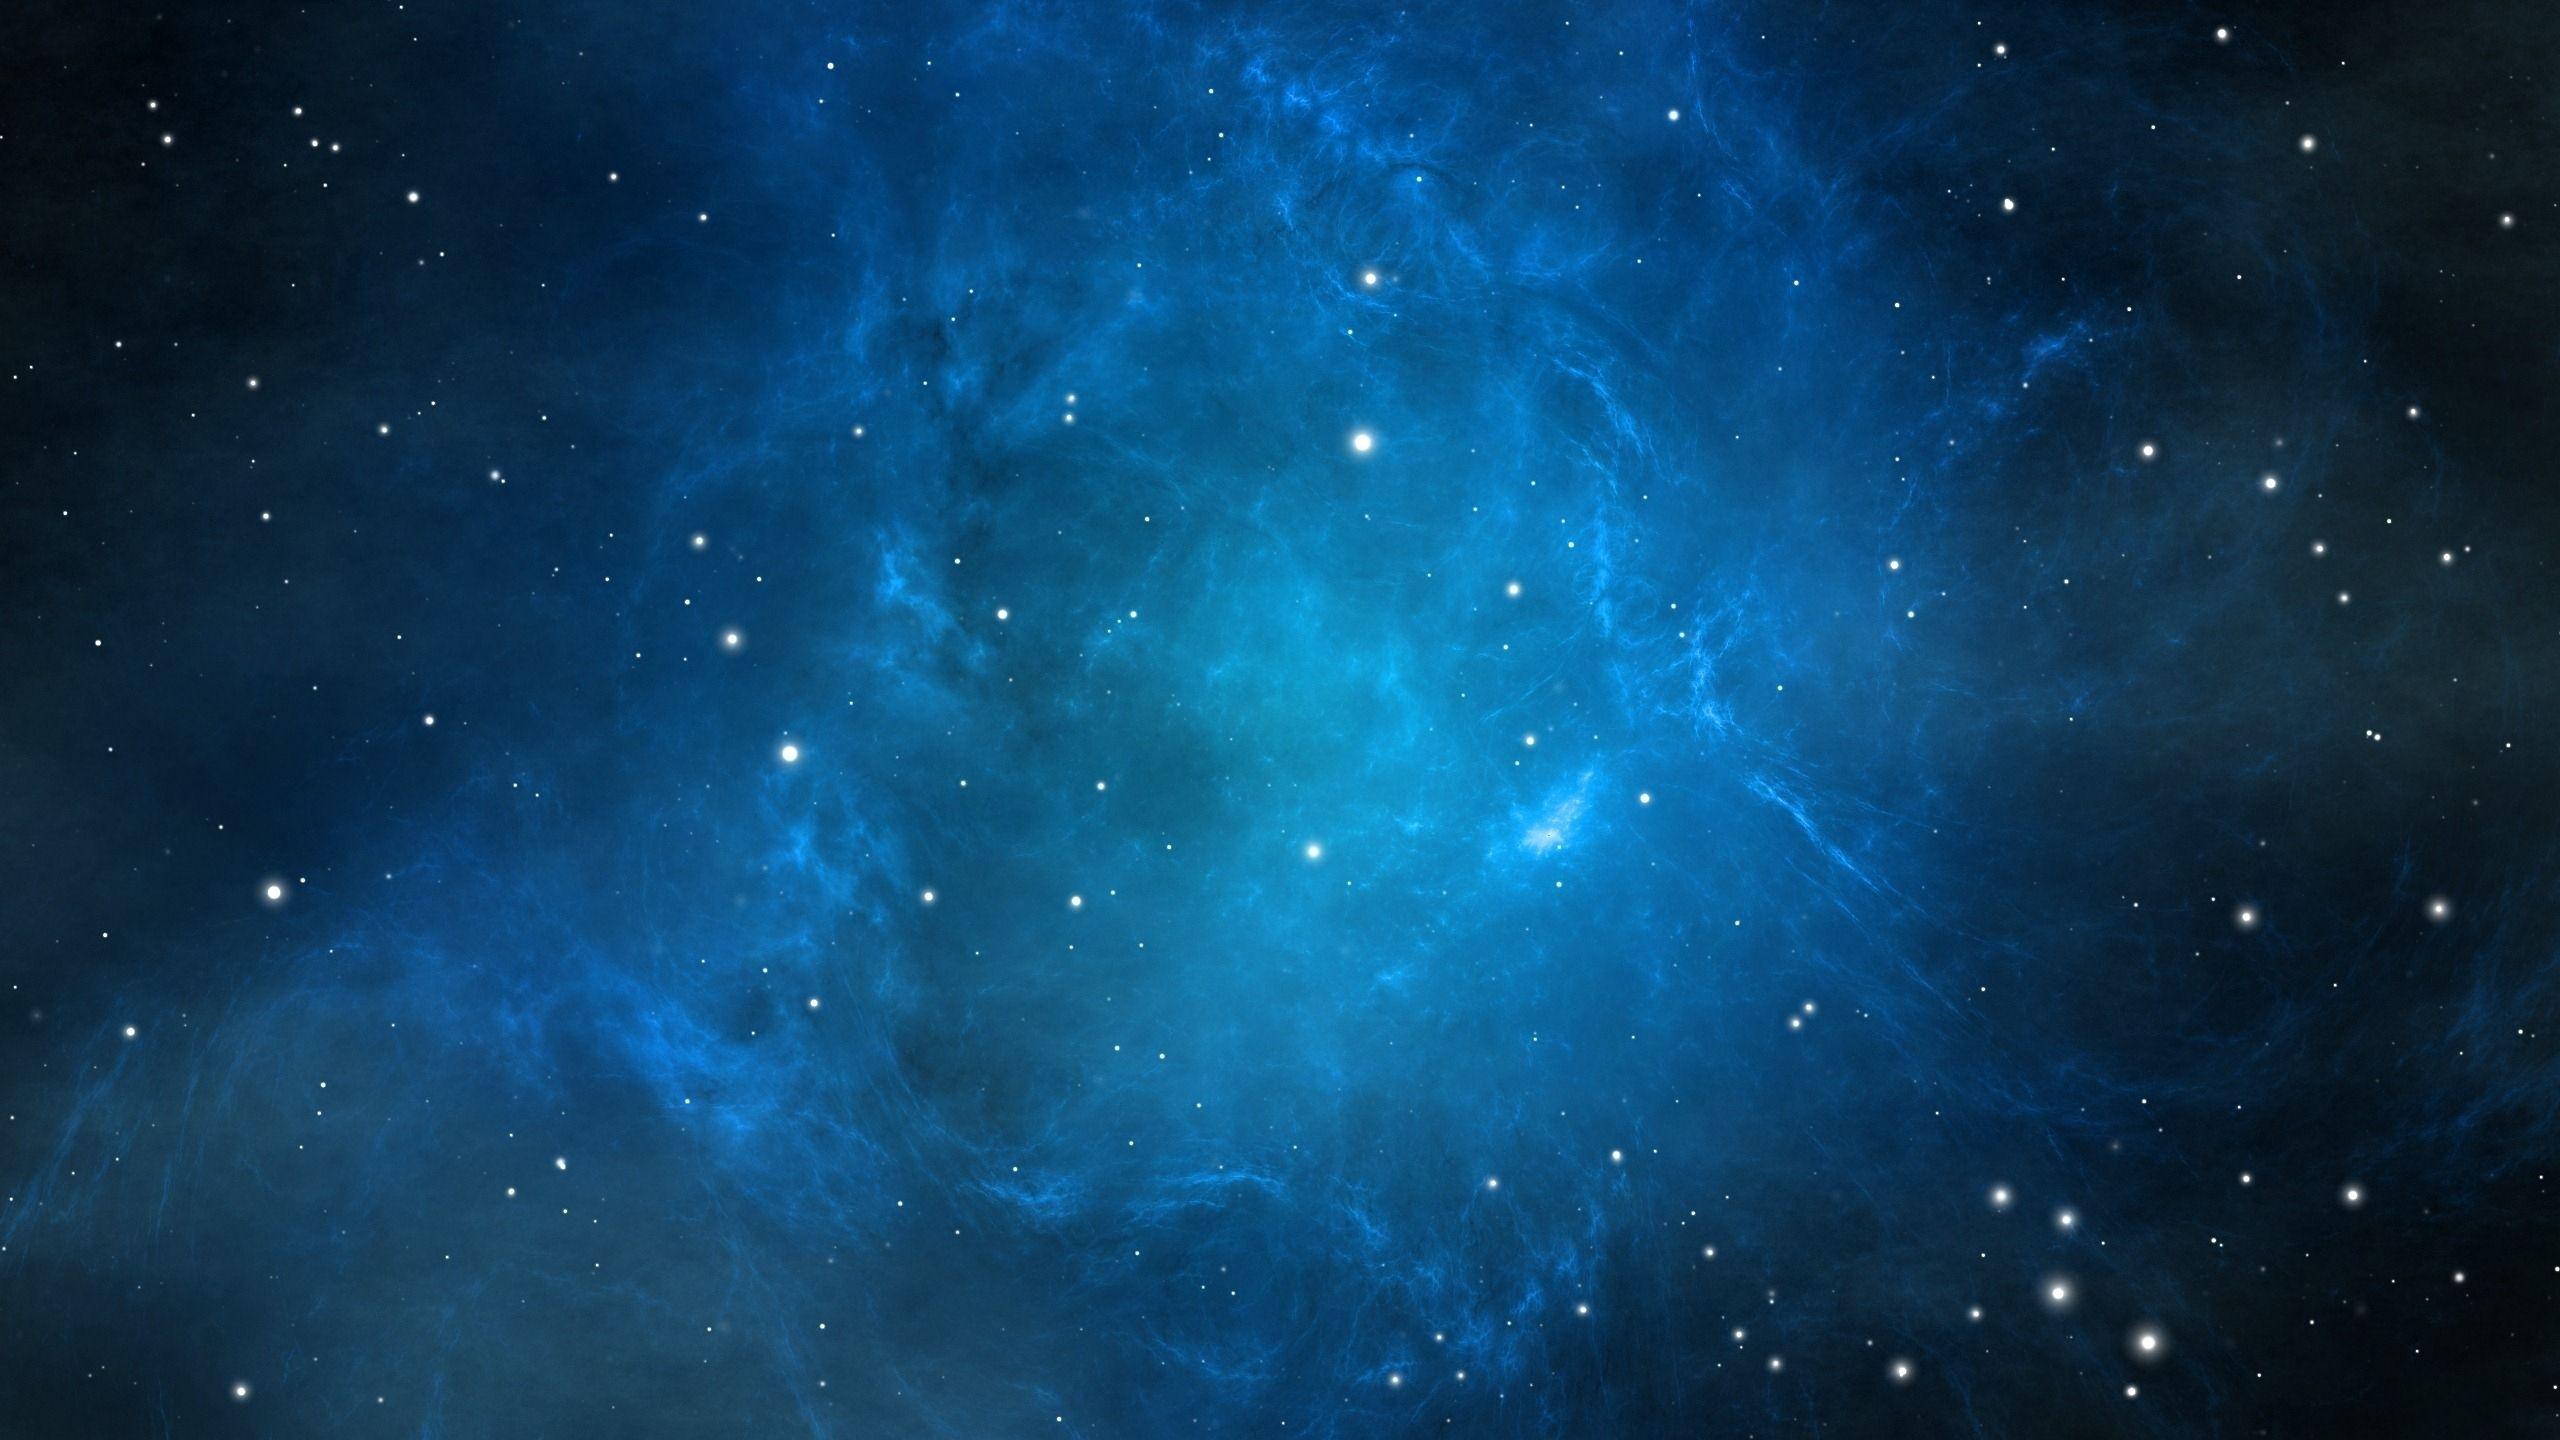 2560x1440 Galaxy Cosmic Space Wallpaper Hd Galaxy Wallpaper Galaxy Wallpaper Blue Galaxy Wallpaper